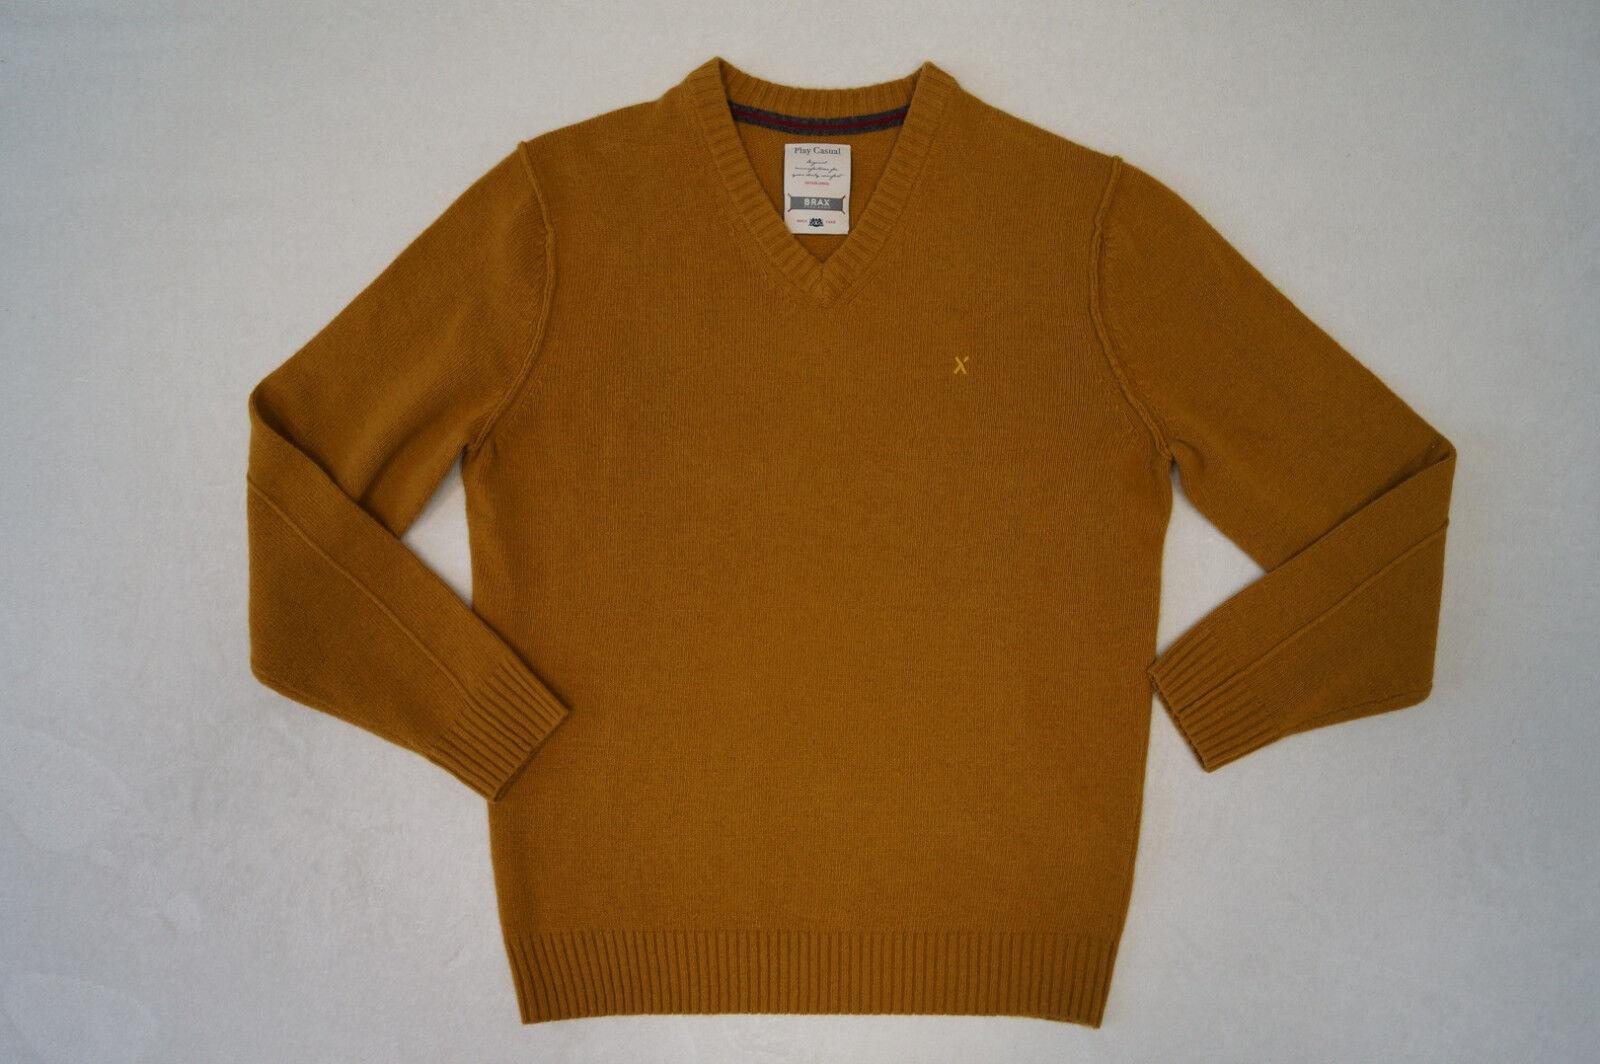 BRAX  Vico Pullover V-Ausschnitt  Gr. 50  80%Wolle gelb-sand NEU